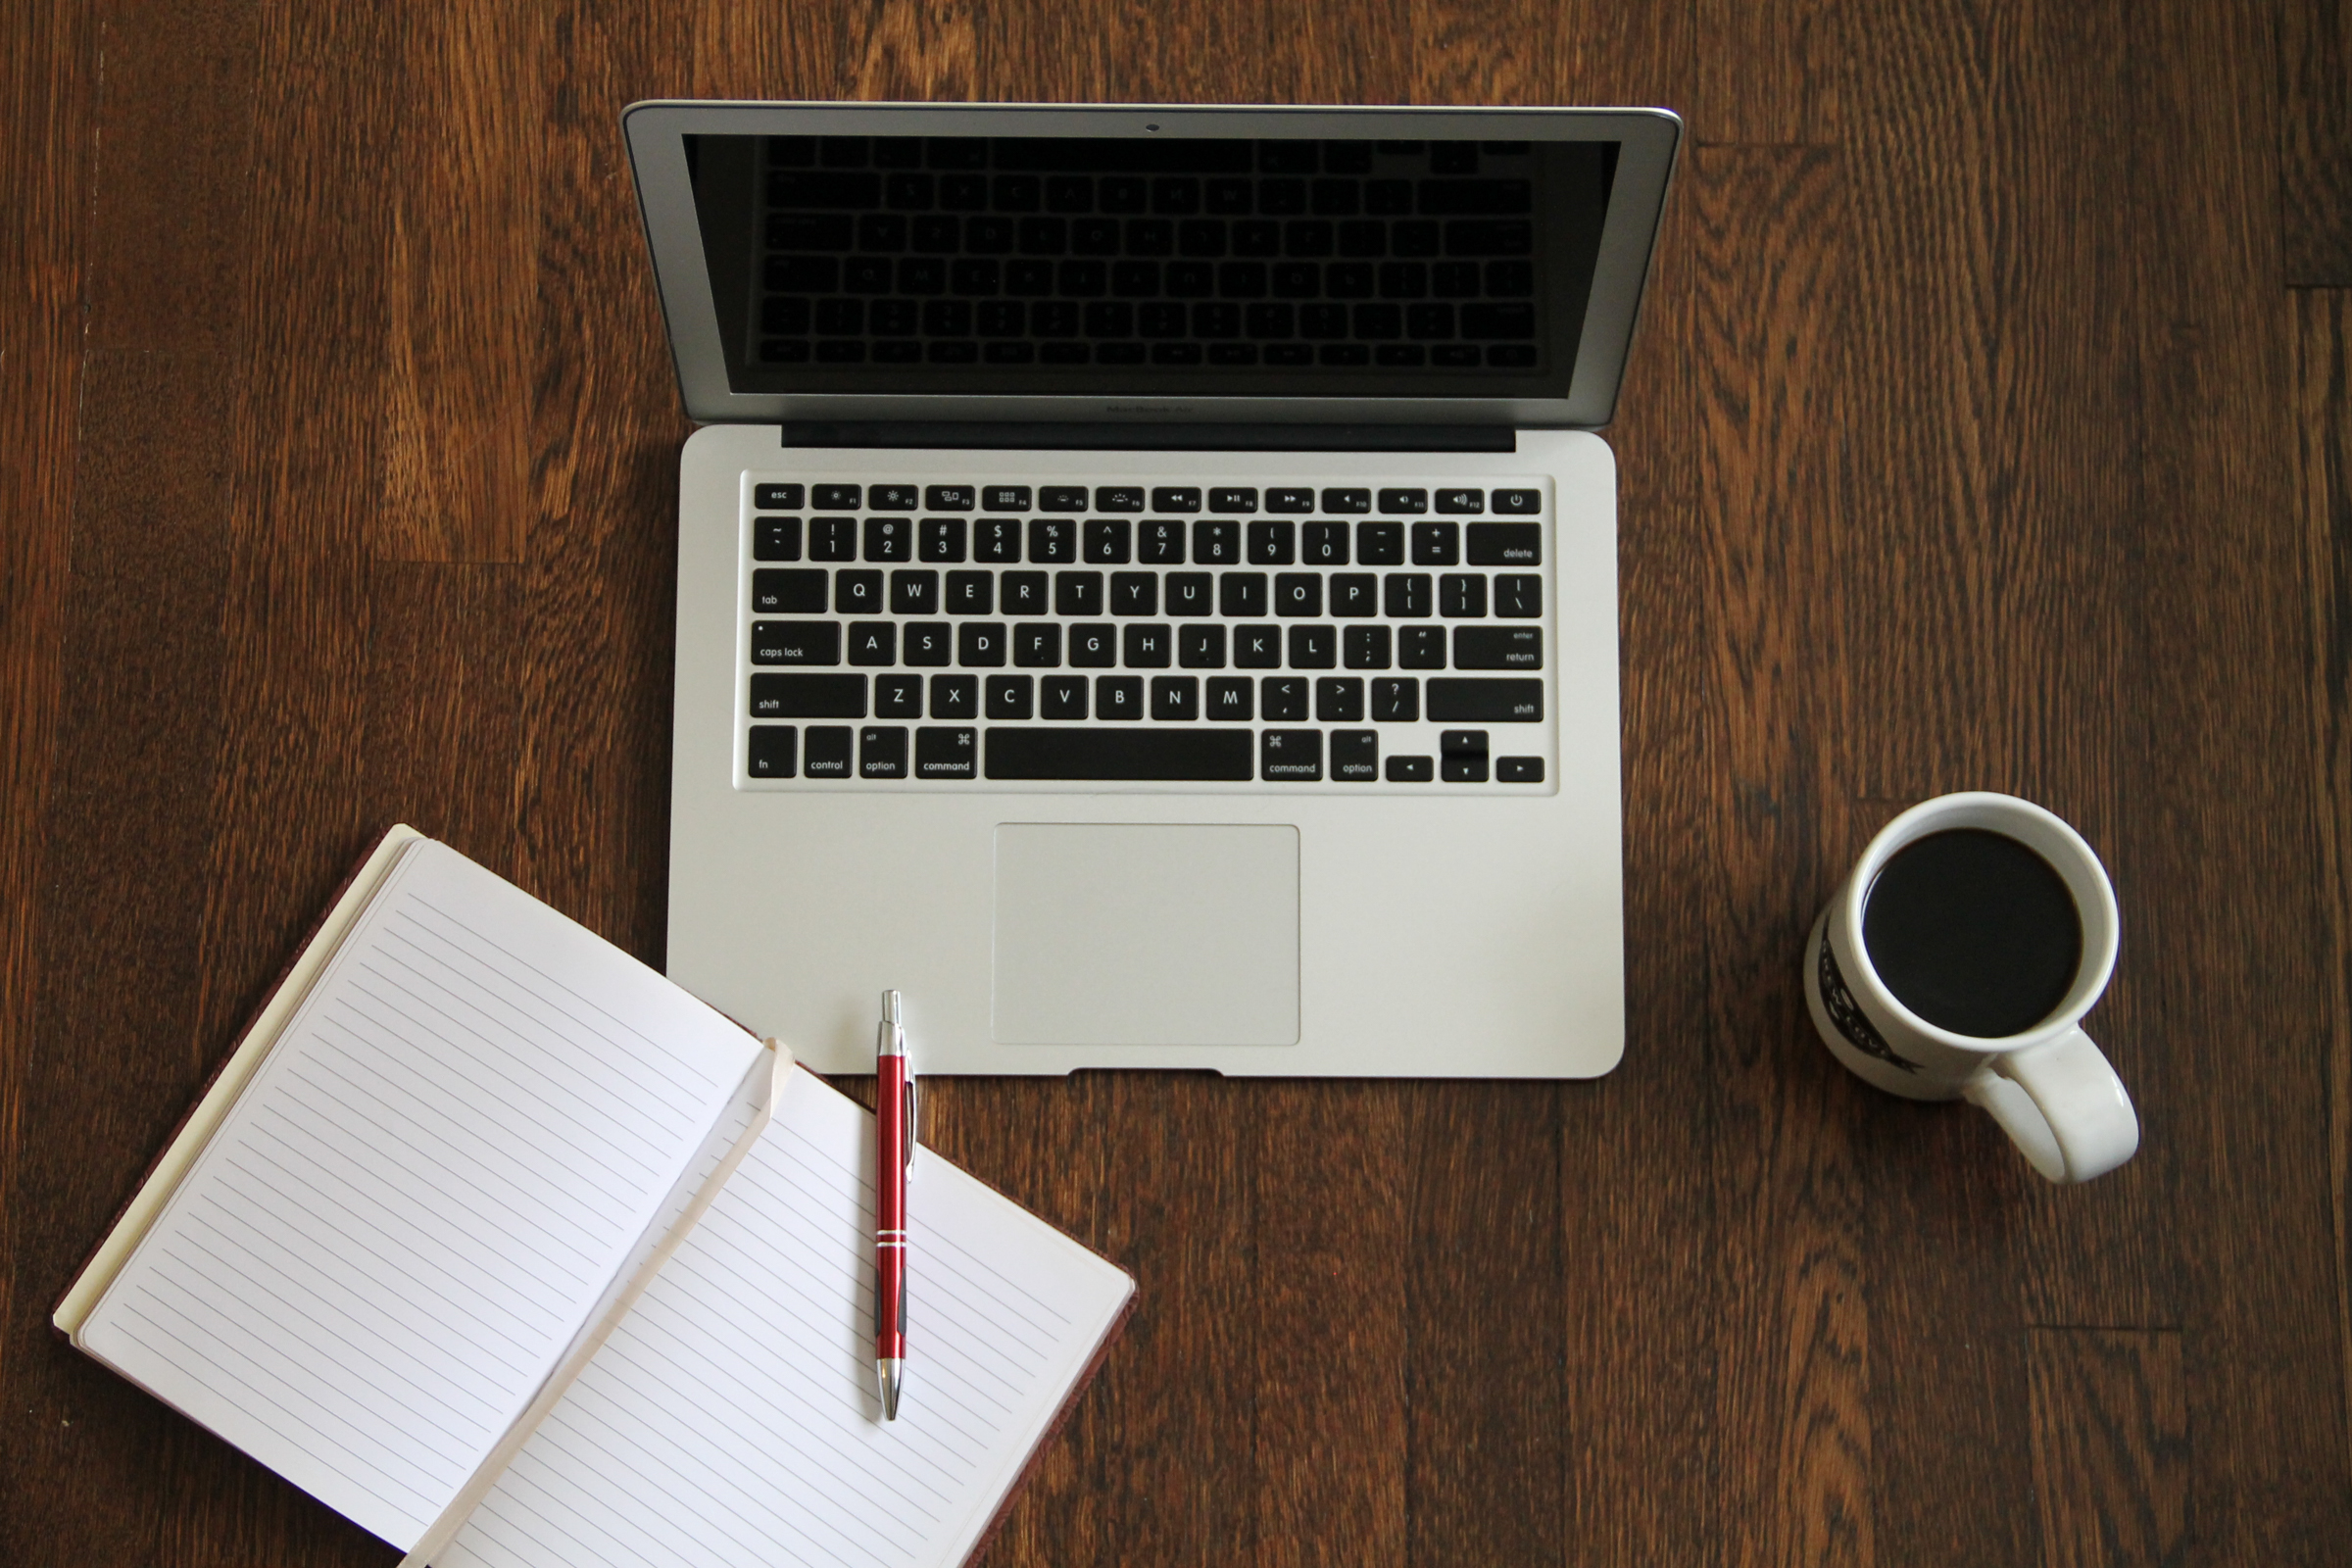 laptop-journal-book-coffee.jpg